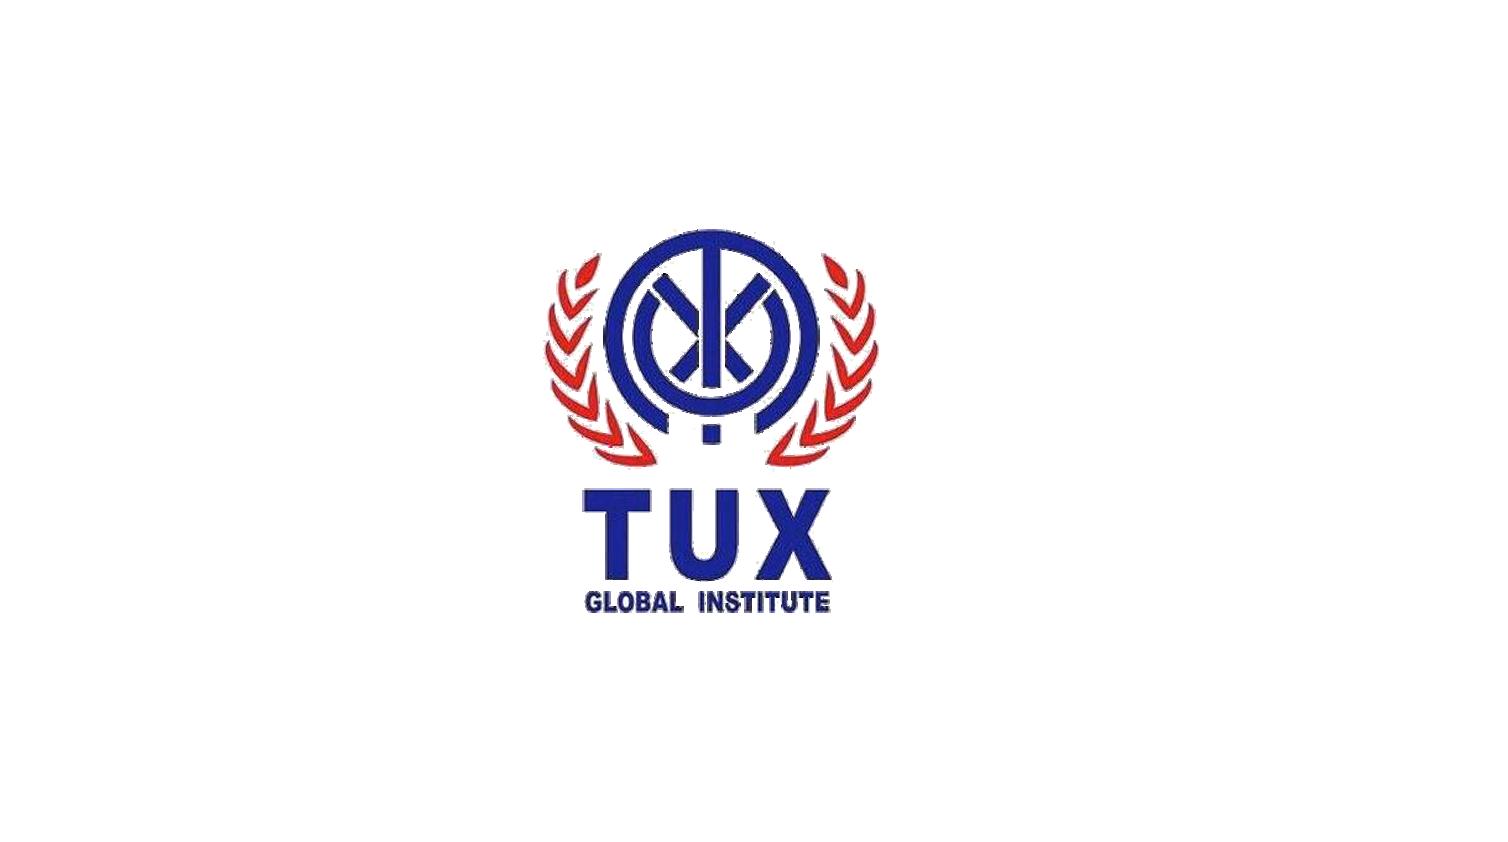 TUX Global Institute